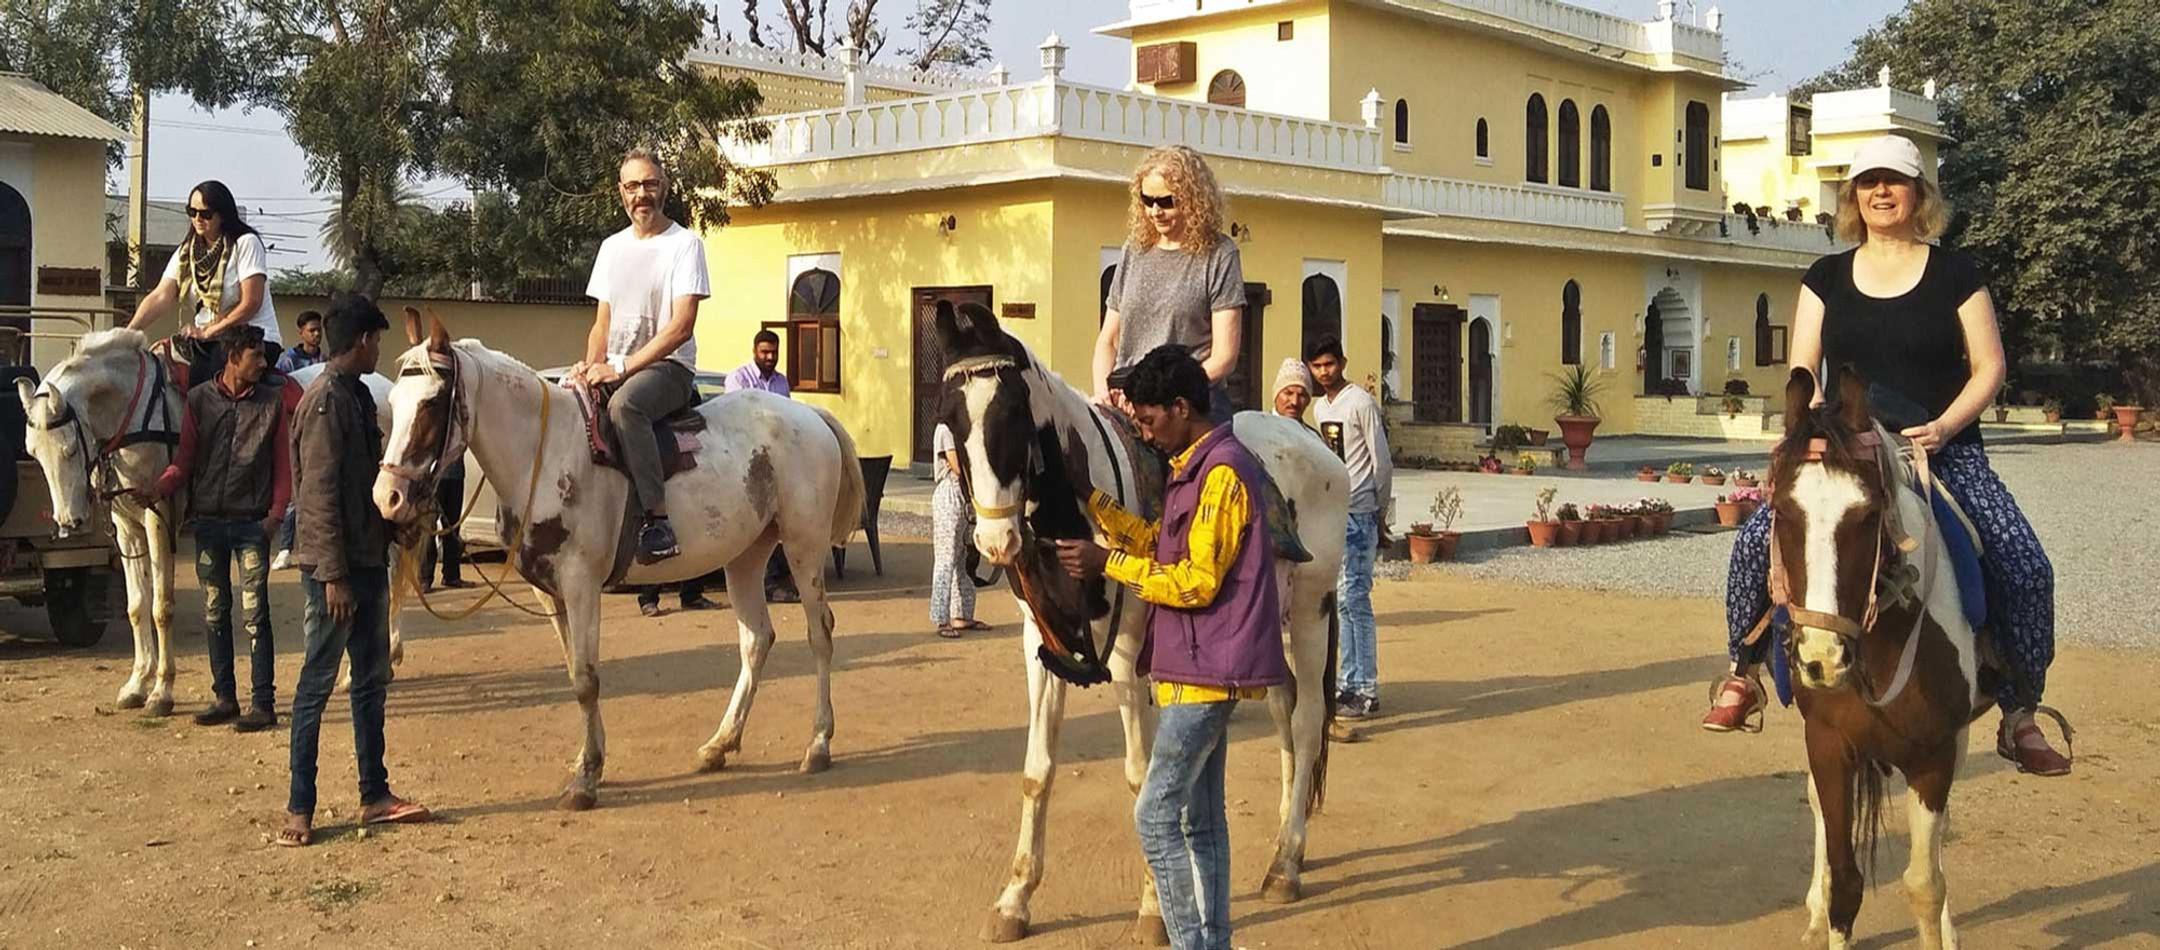 barabagh deogarh_horse riding.jpg